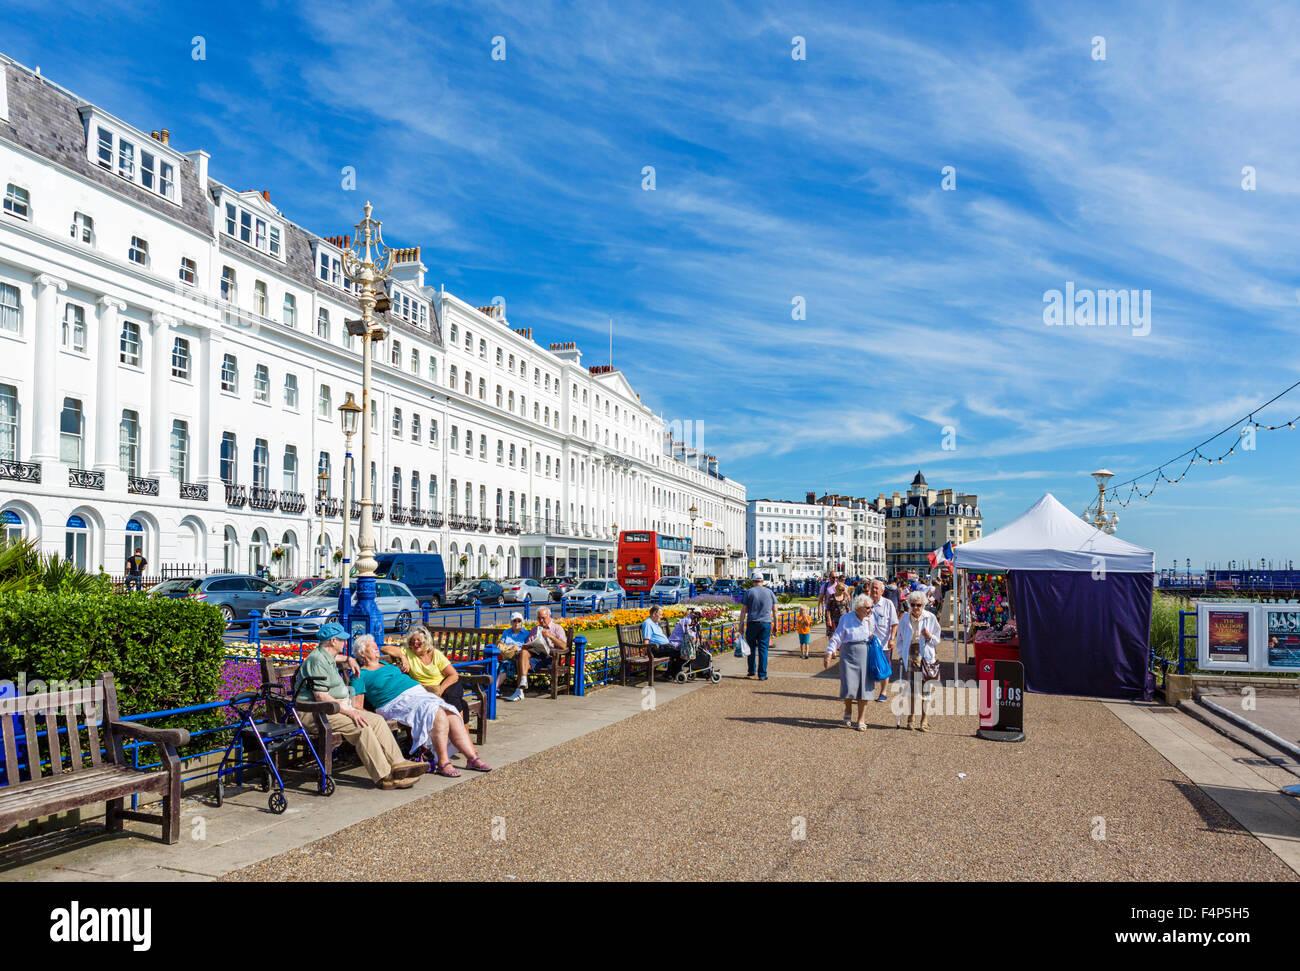 Grand Parade in Eastbourne, East Sussex, England, Regno Unito Immagini Stock